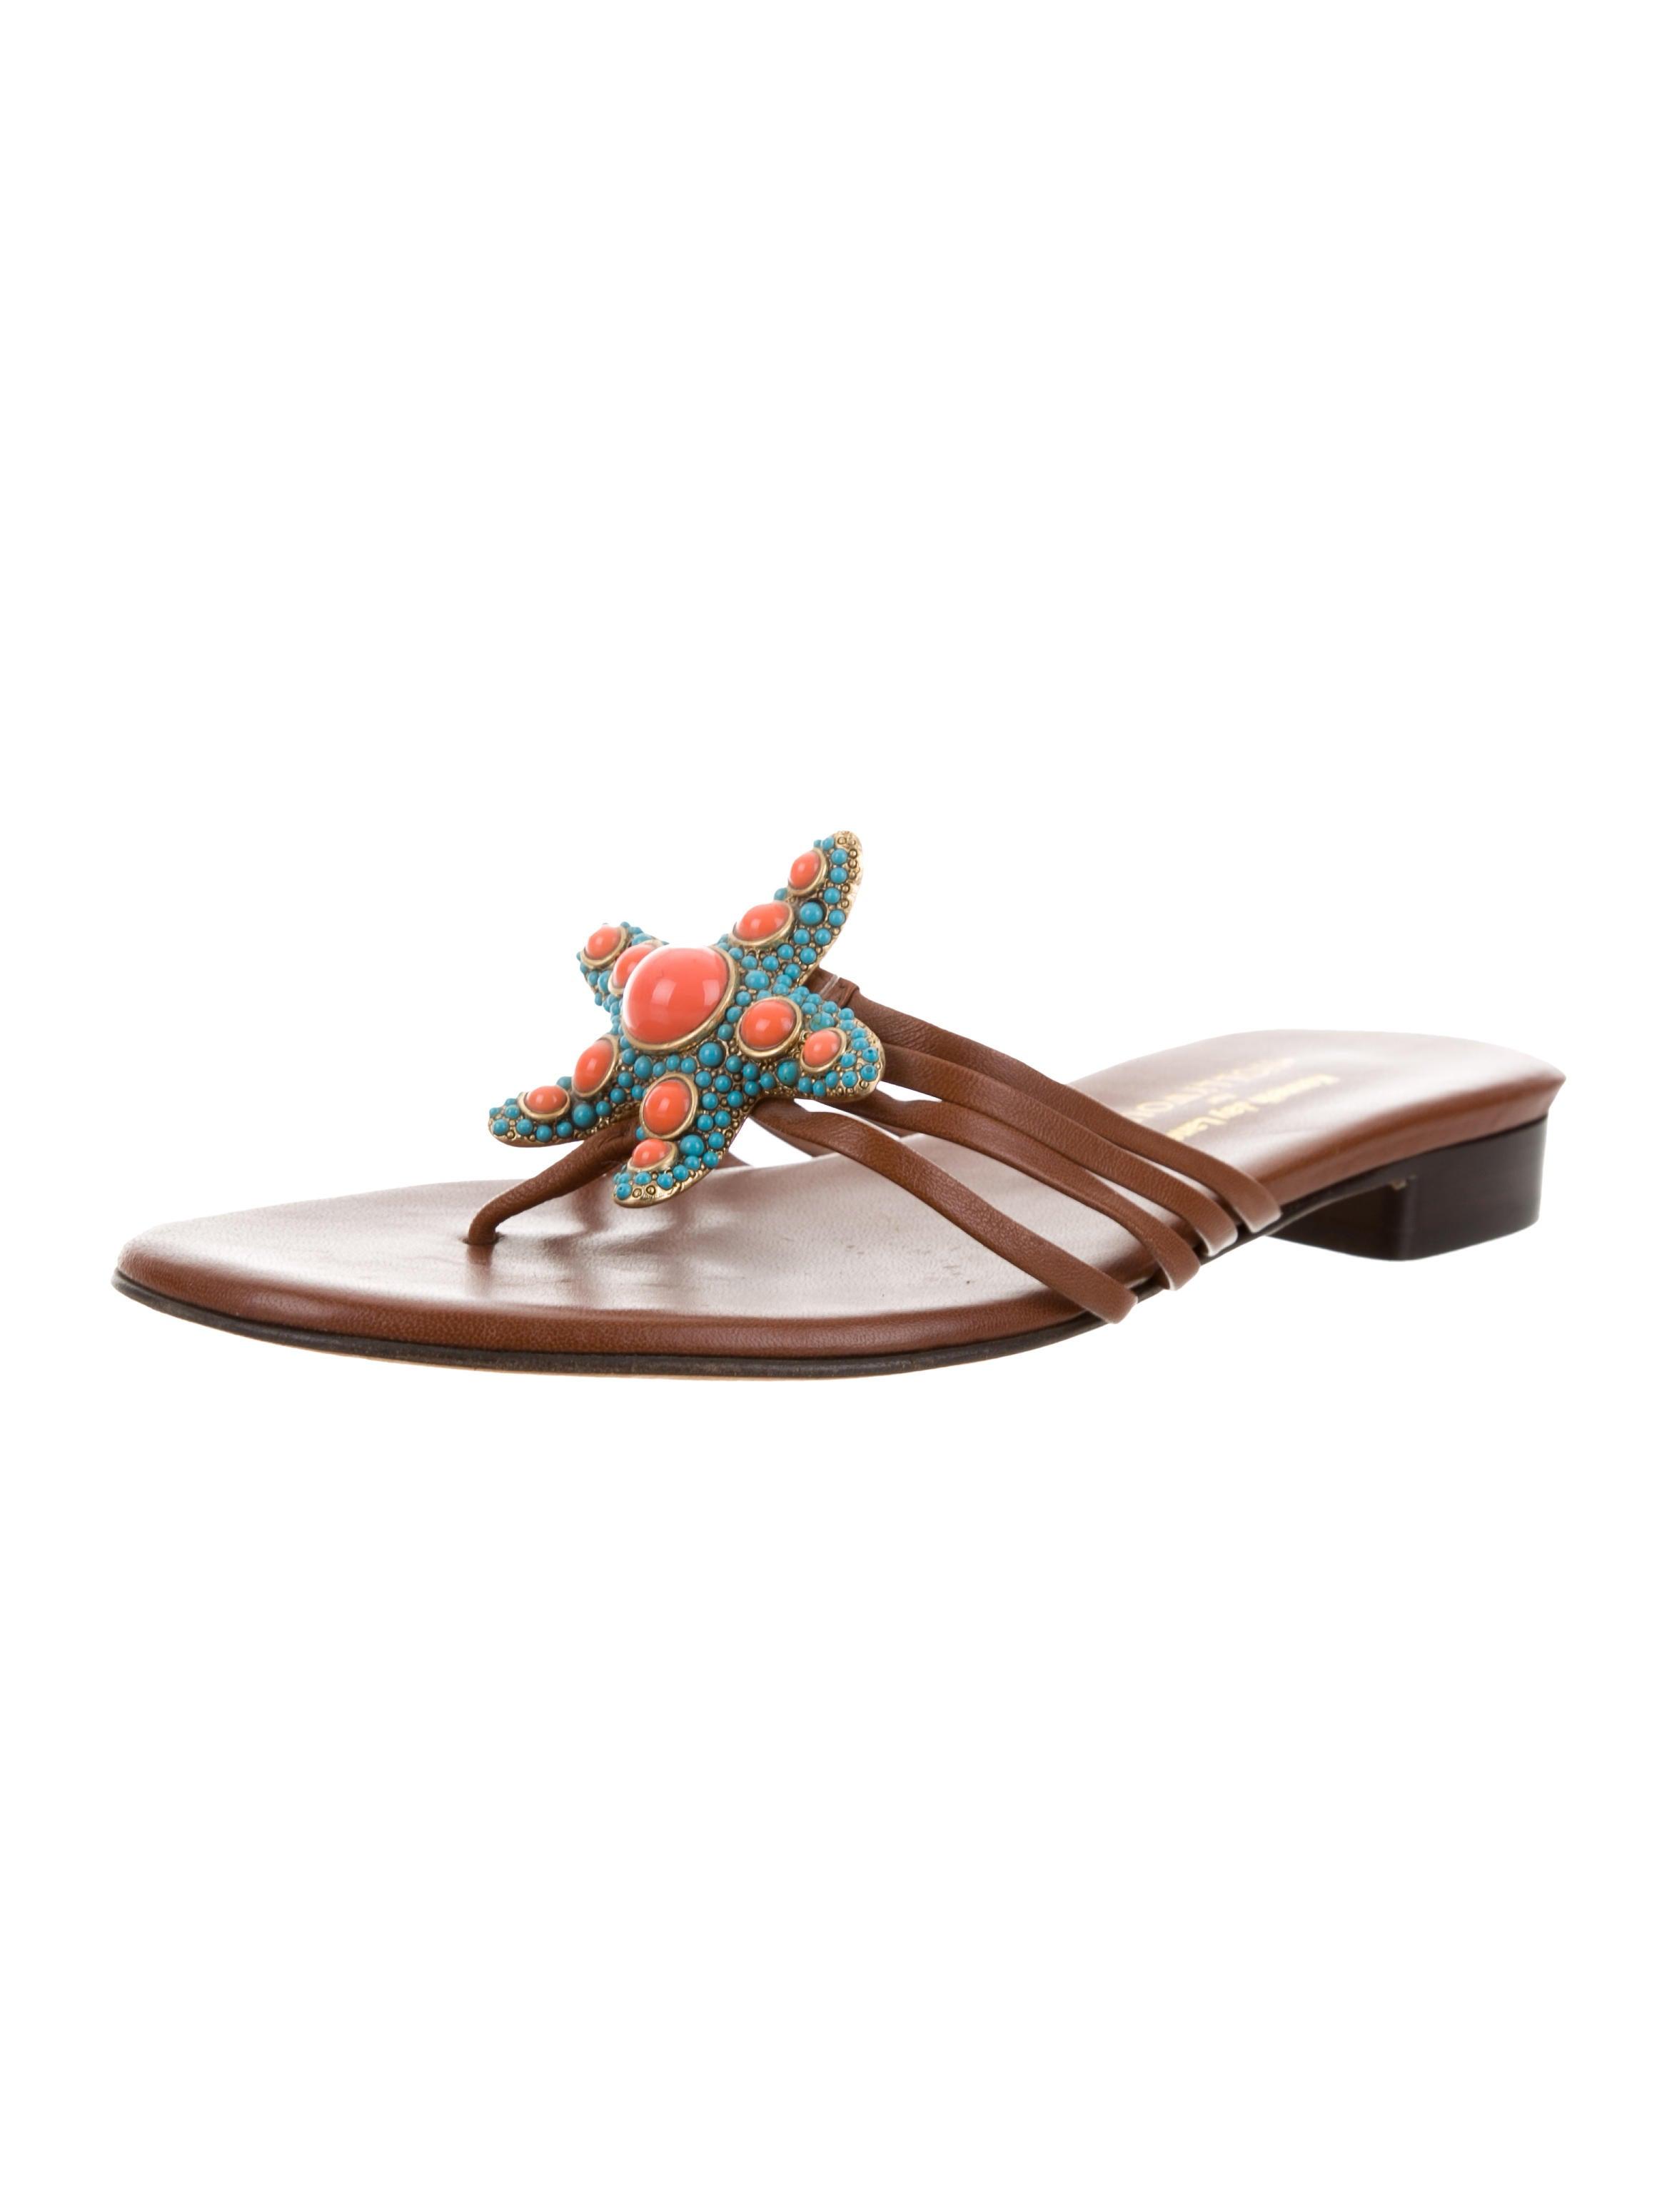 Kenneth Jay Lane Embellished Thong Sandals 2014 new for sale QfnxIH